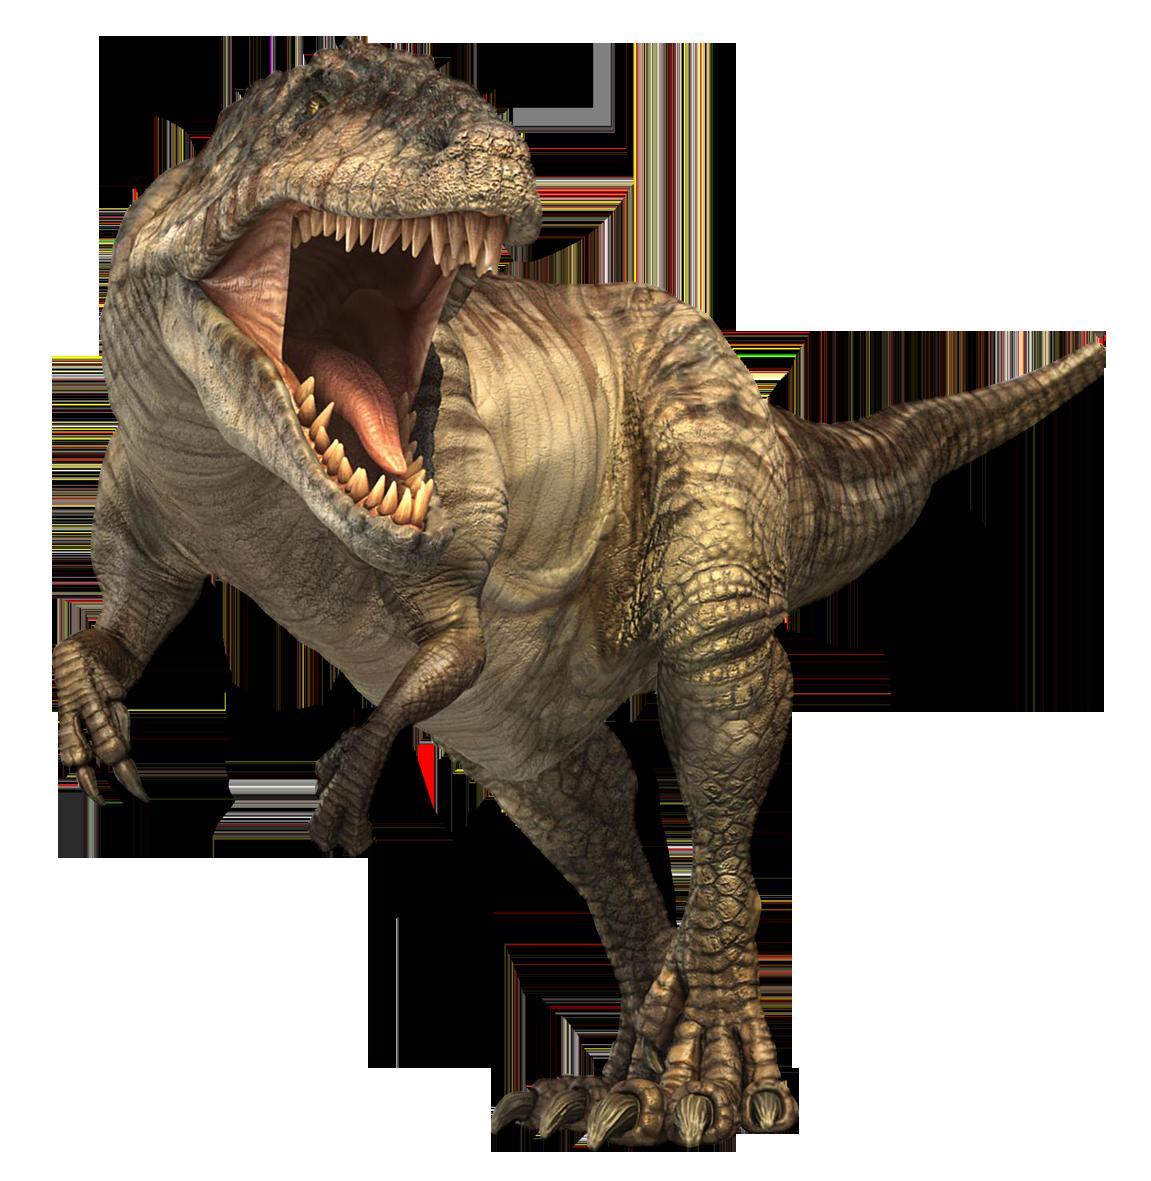 Imagenes de dinosaurios rex png 3